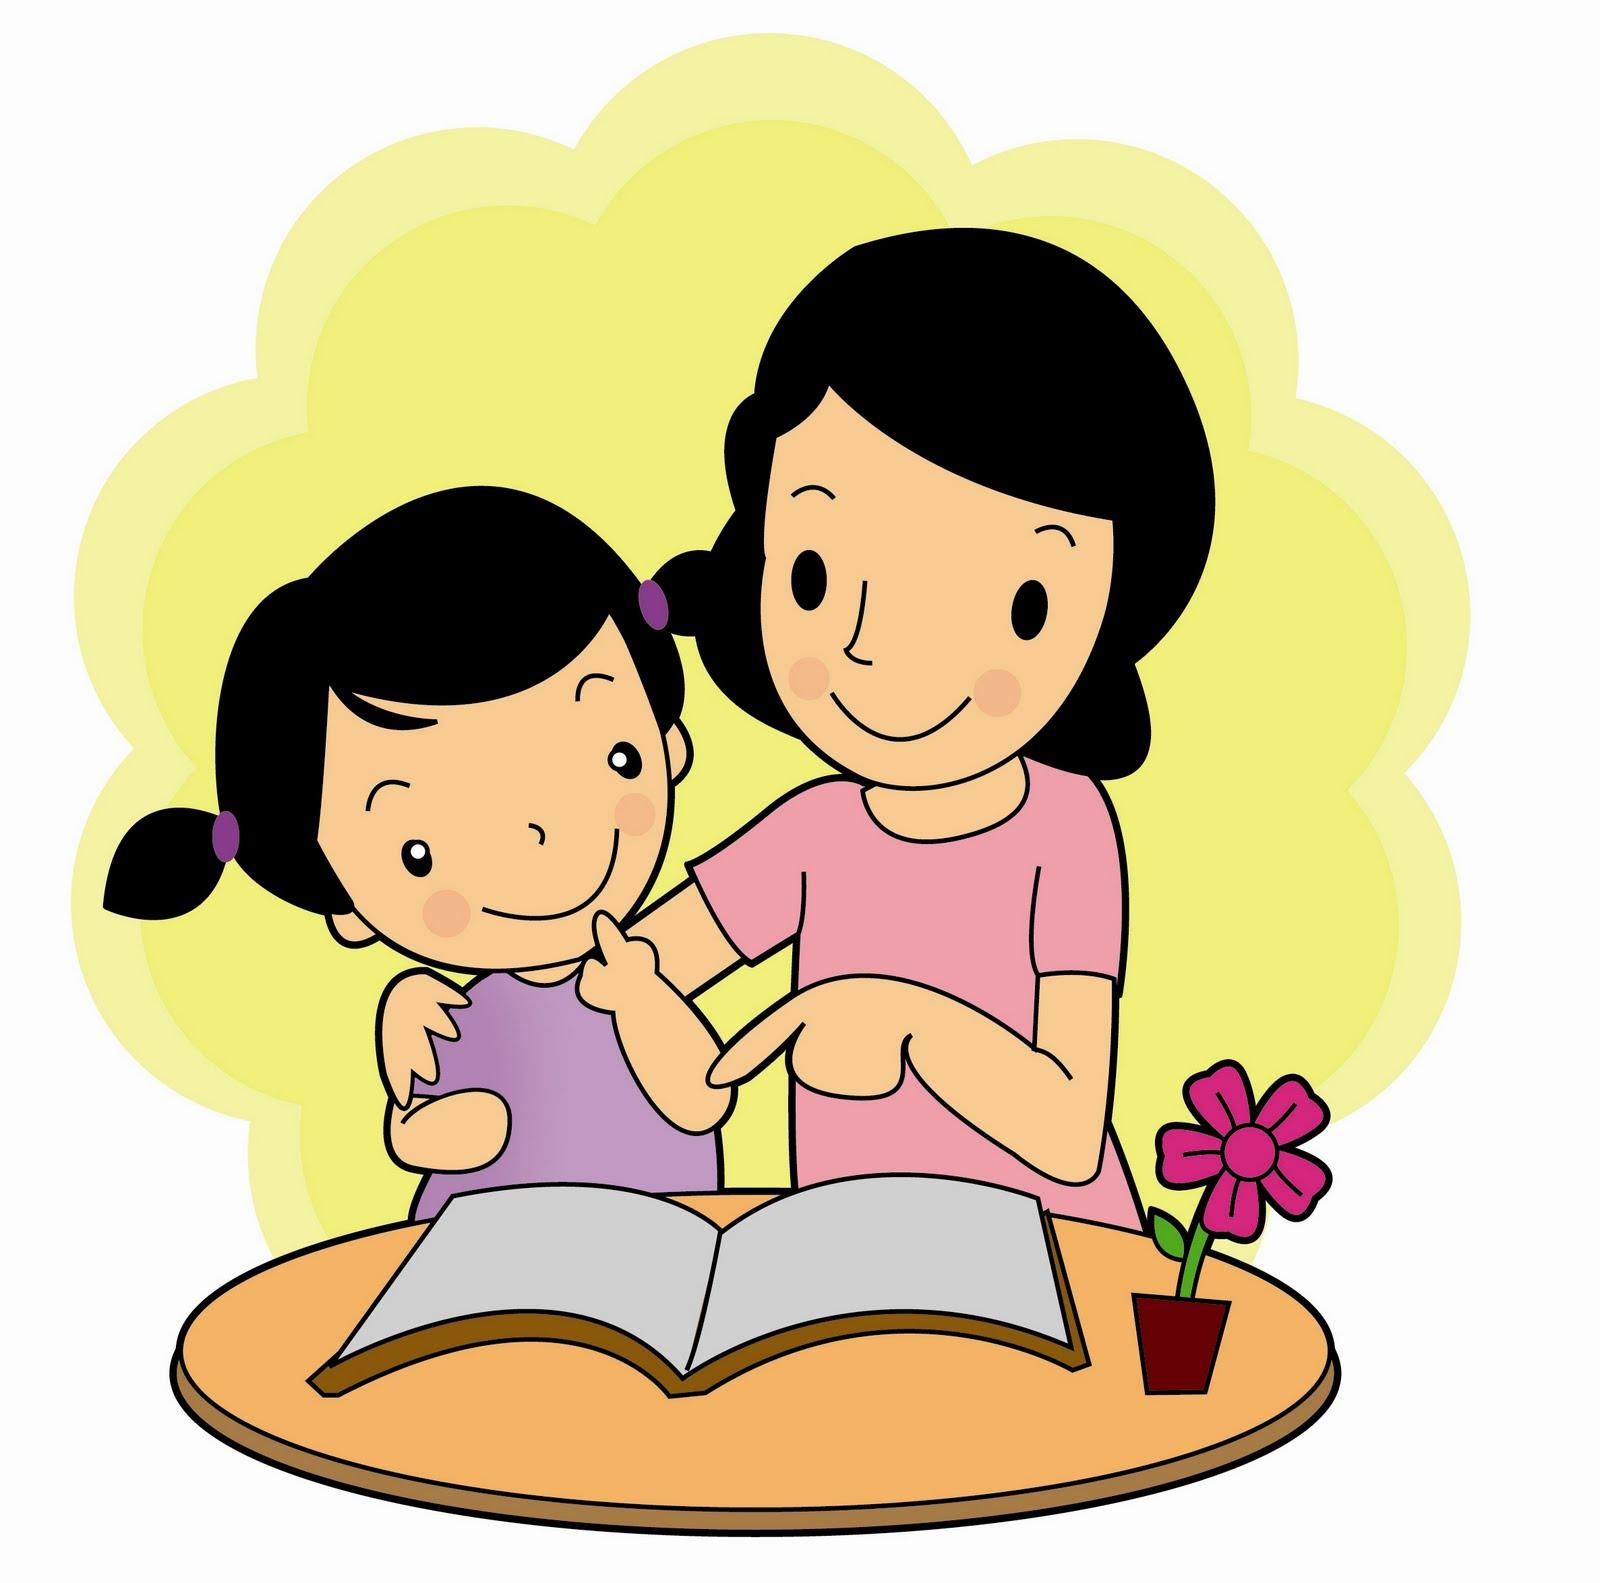 49 Gambar Kartun Lucu Ibu Dan Anak